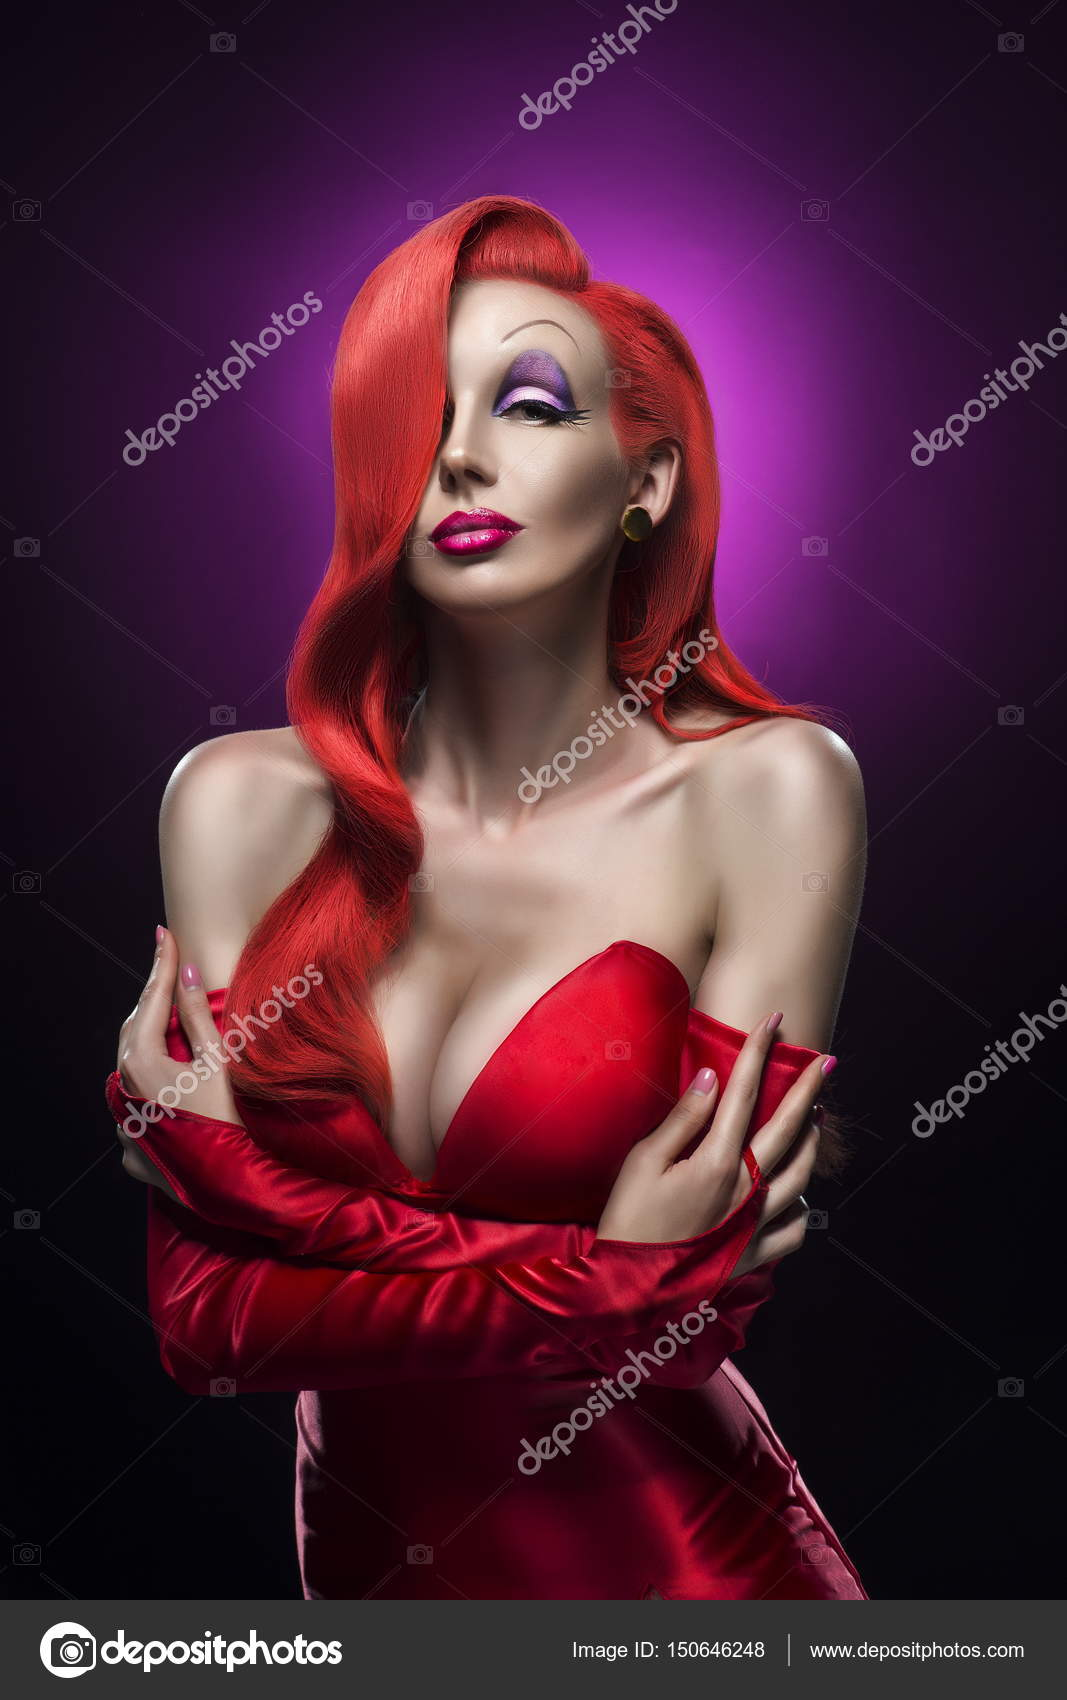 video-seksualnoe-foto-devushki-s-krasnimi-volosami-zhopoy-chlen